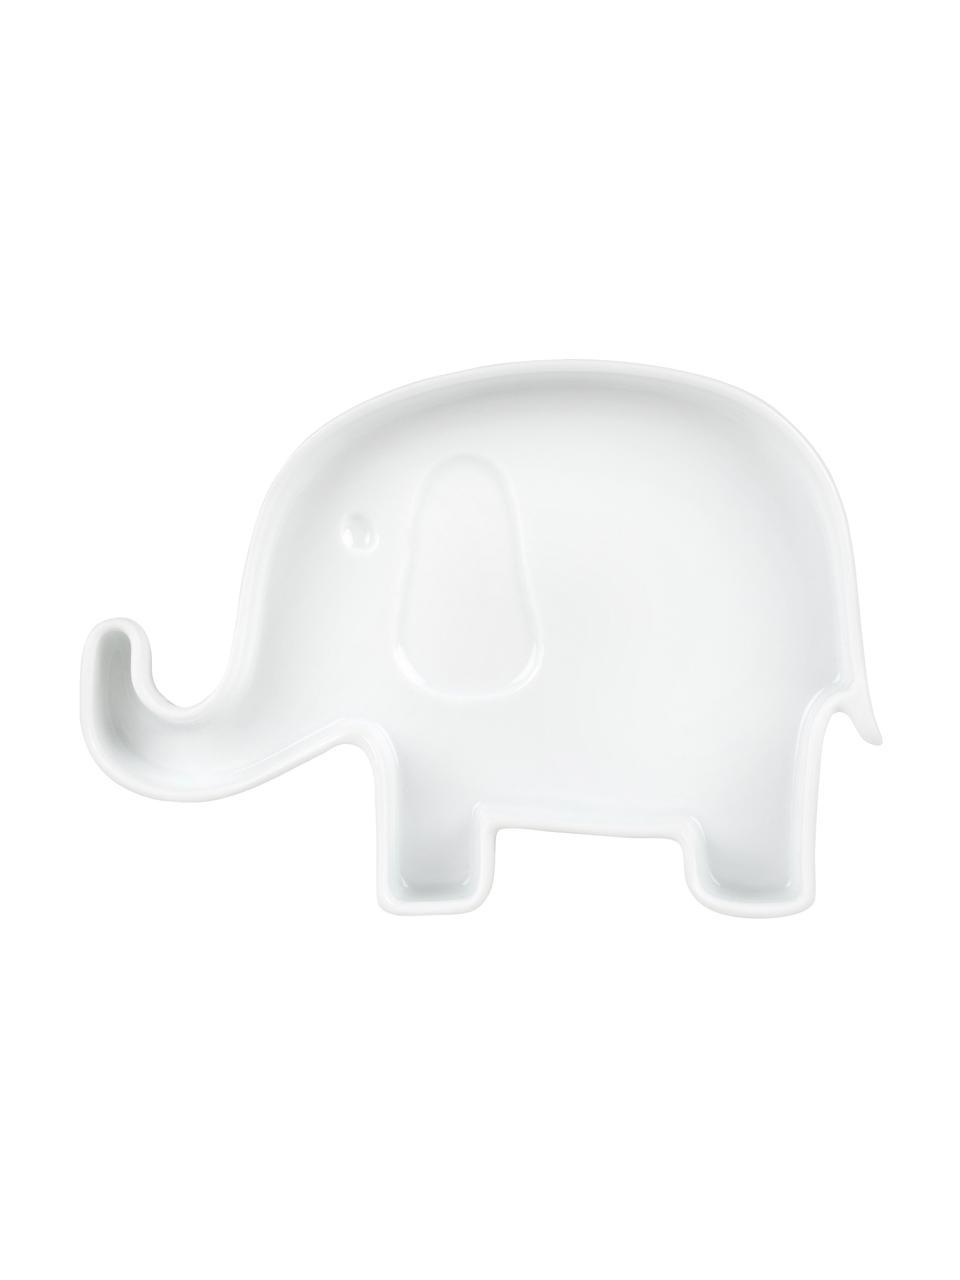 Kinder dinerbord Elefant van porselein, Porselein, Wit, 18 x 2 cm